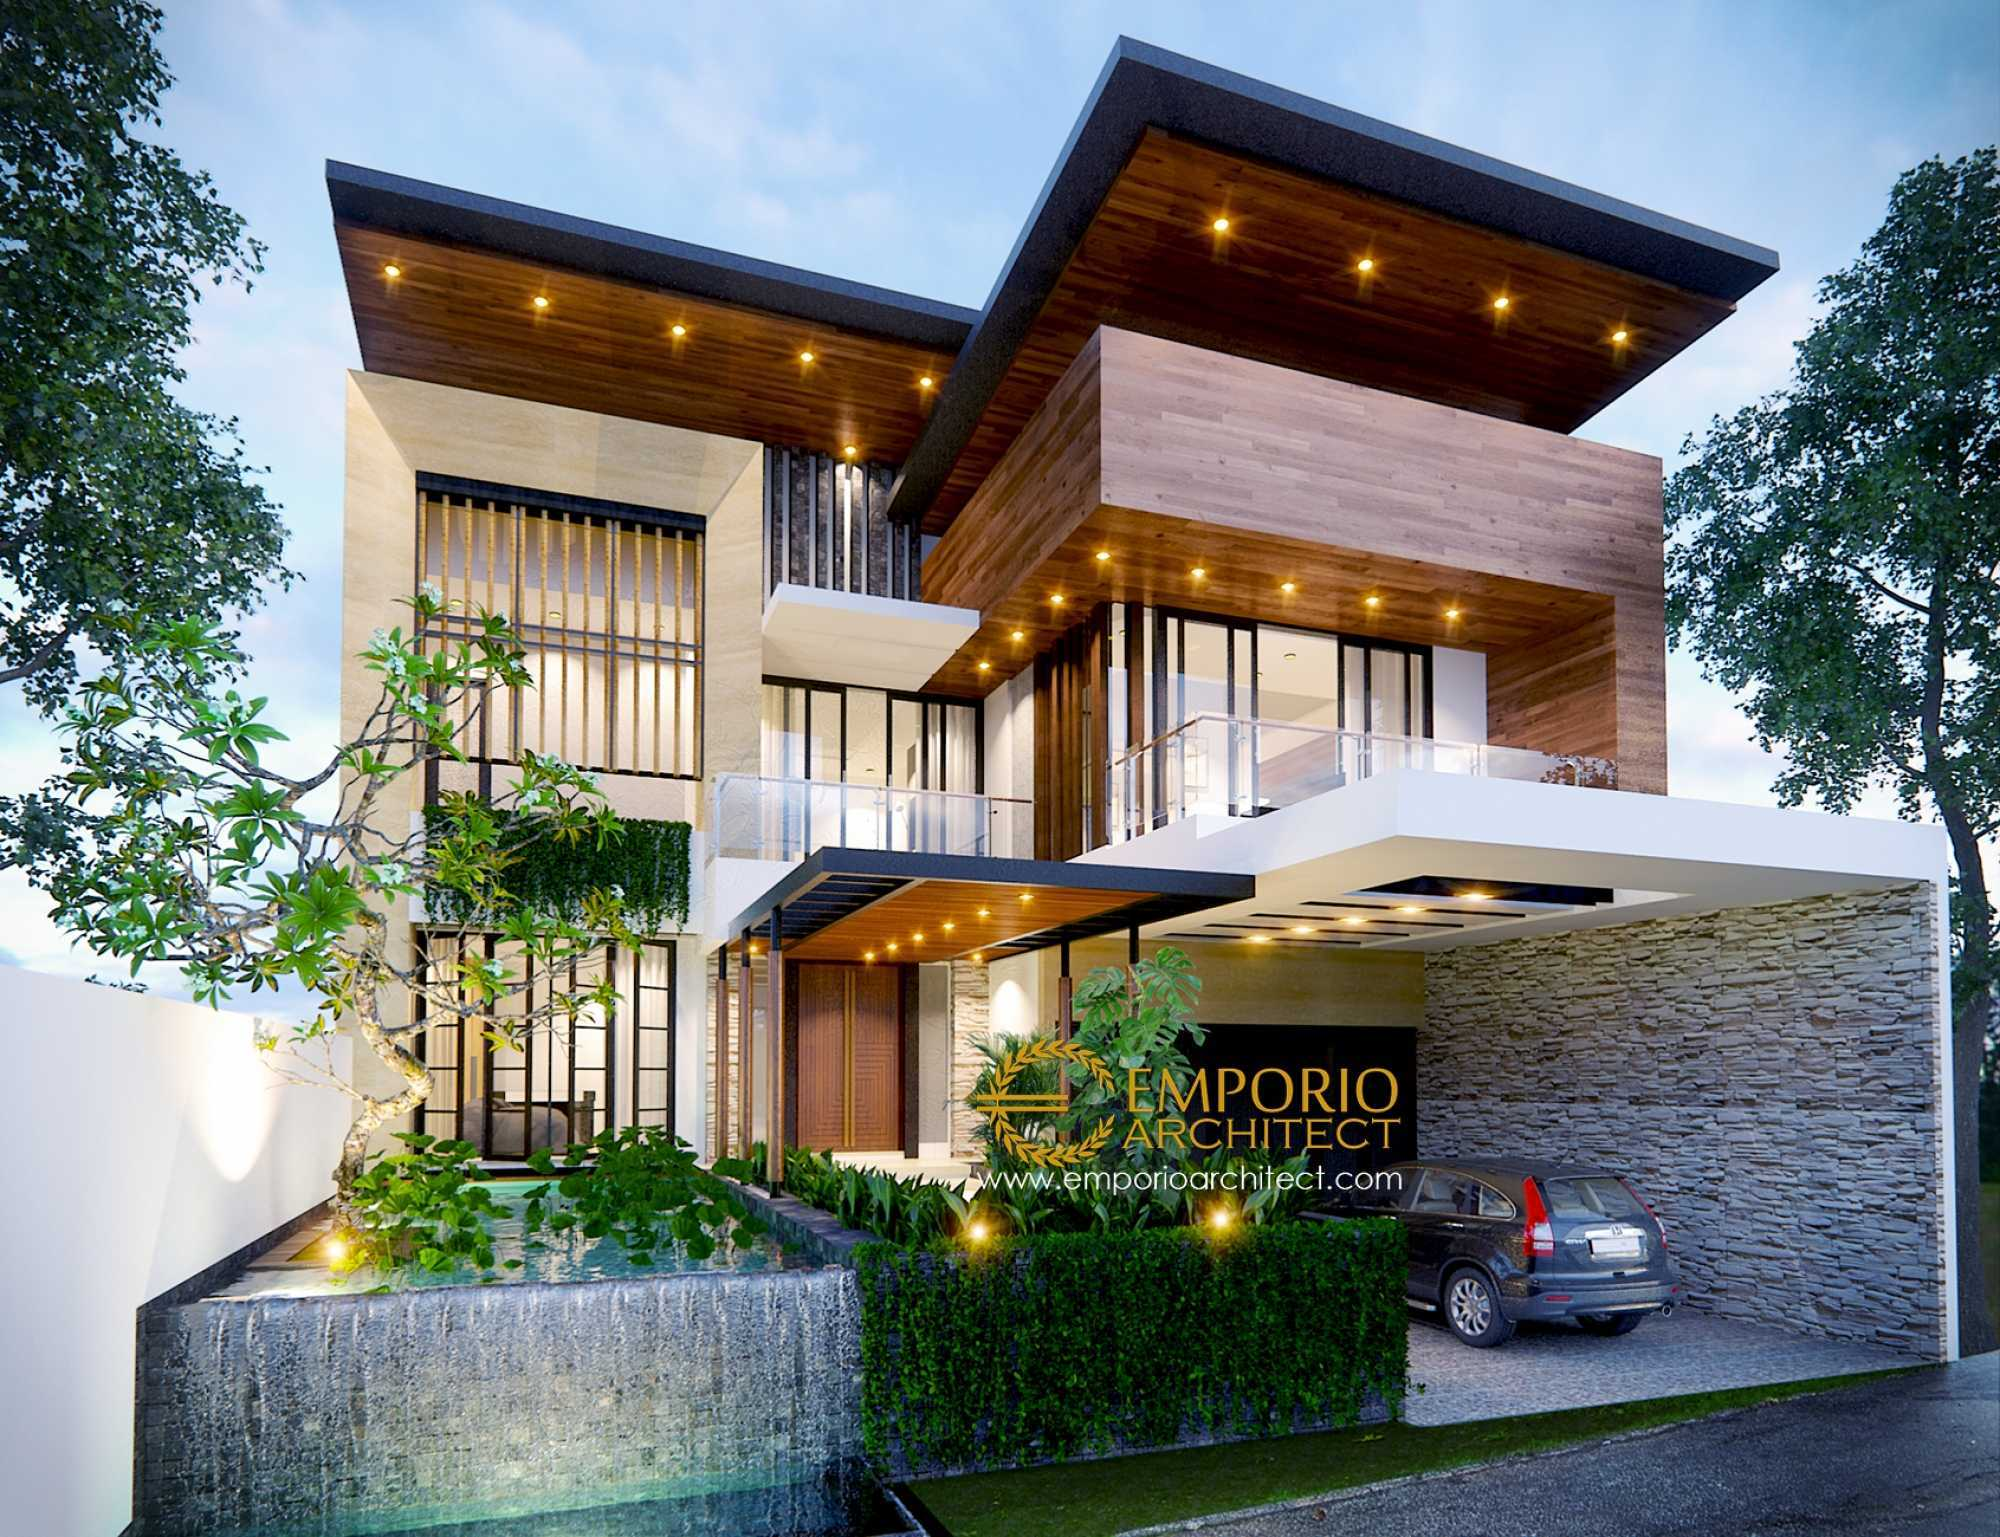 Jasa Arsitek Emporio Architect di Bandung